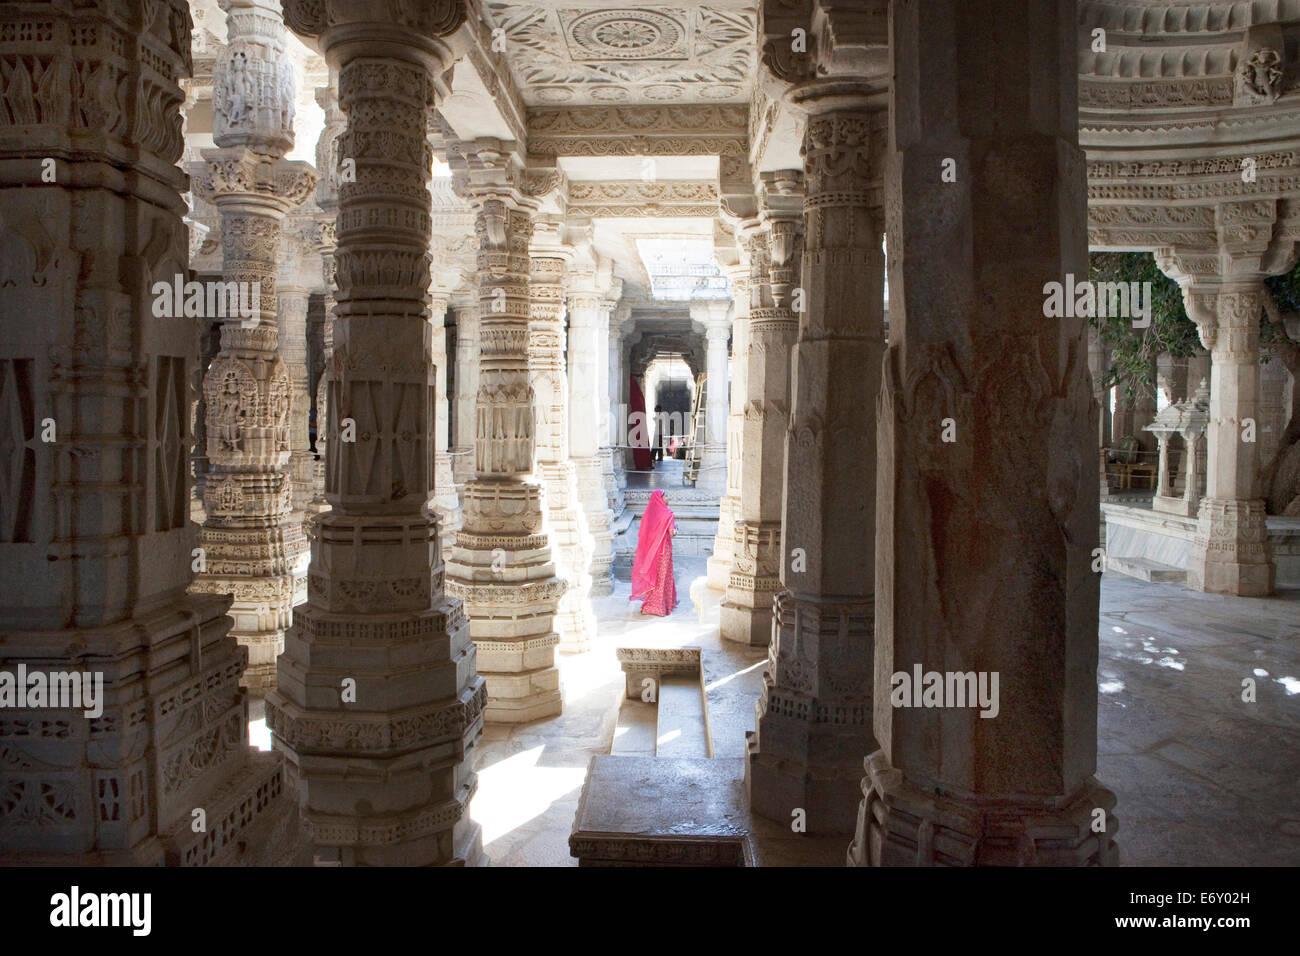 Indian woman wearing sari between the pillars of the jainist main temple Chaumukha Mandir, Ranakpur, Rajasthan, - Stock Image